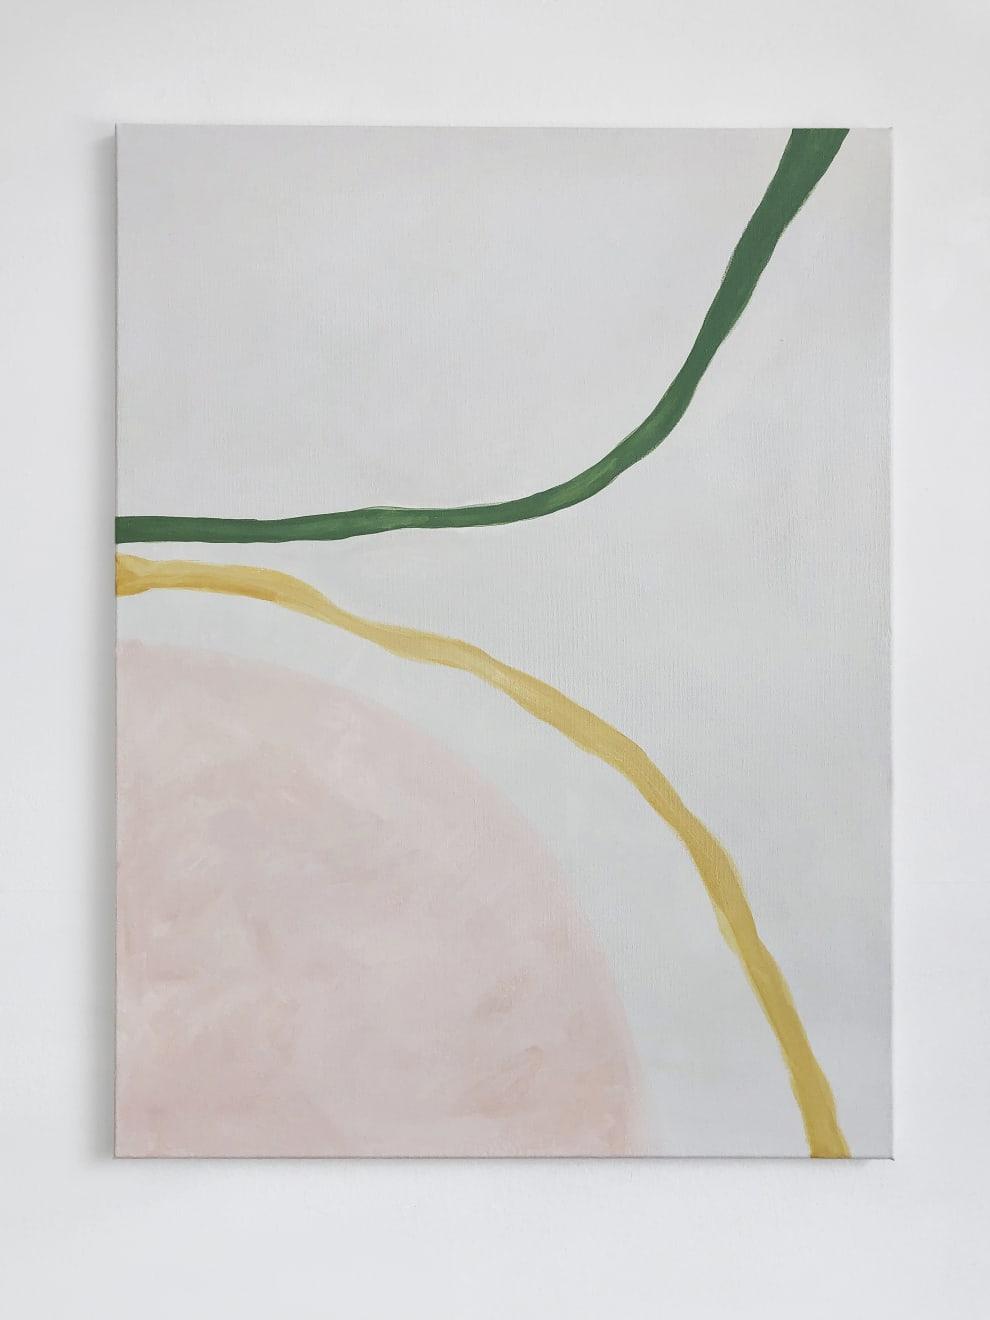 Caroline Popham, Lithe, 2019